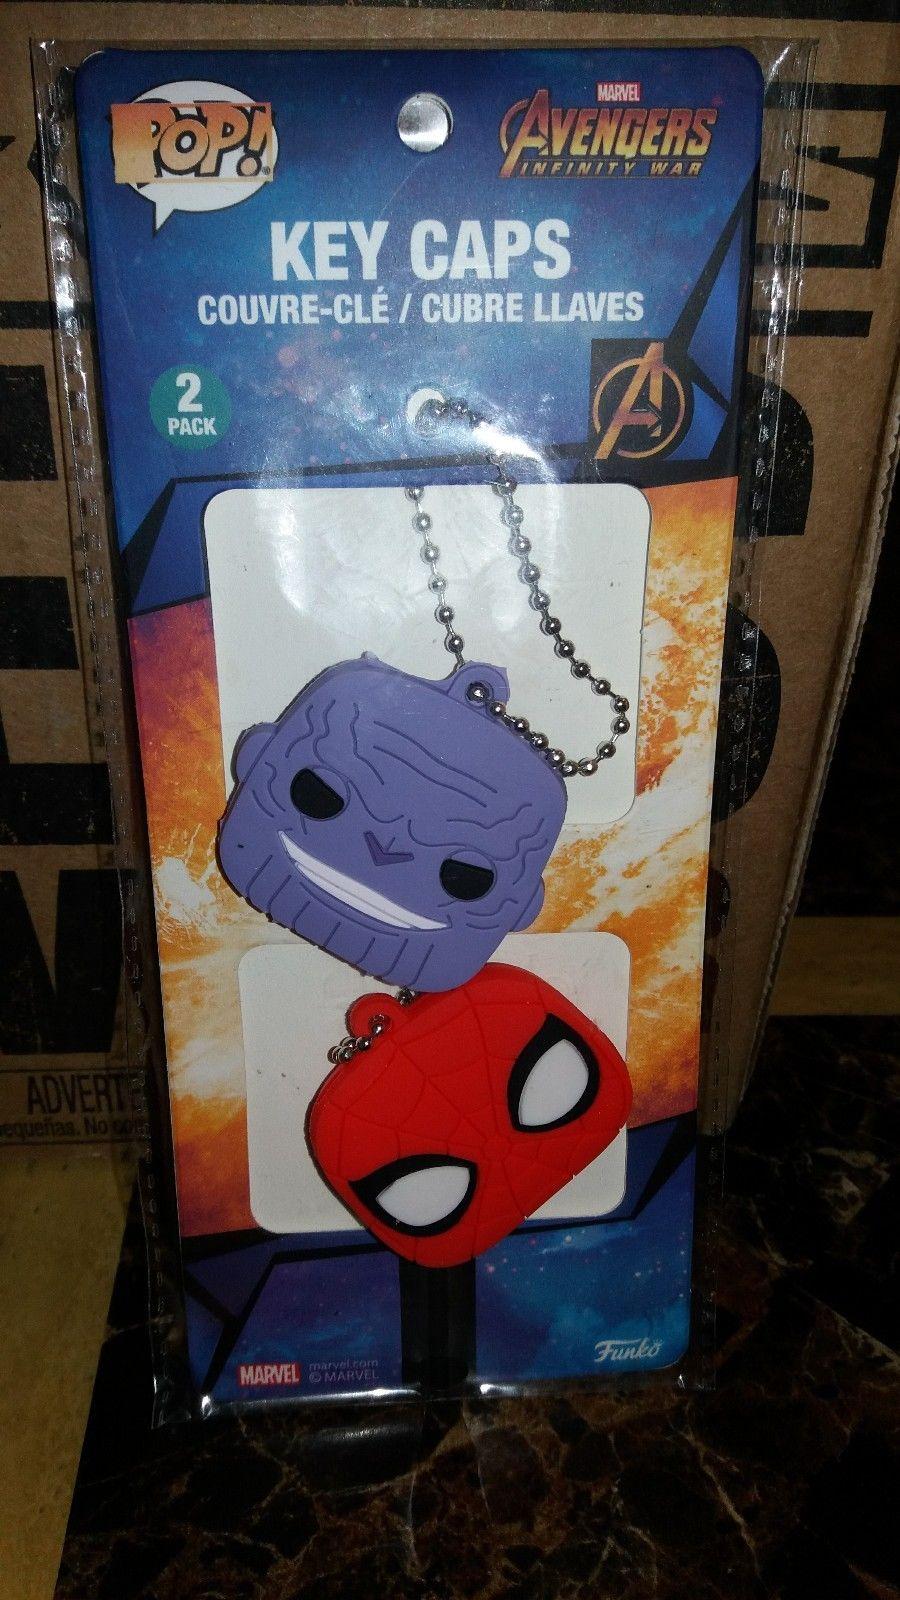 Funko Pop Avengers Infinity War Iron Man Bandana Marvel Collector Corp Exclusive